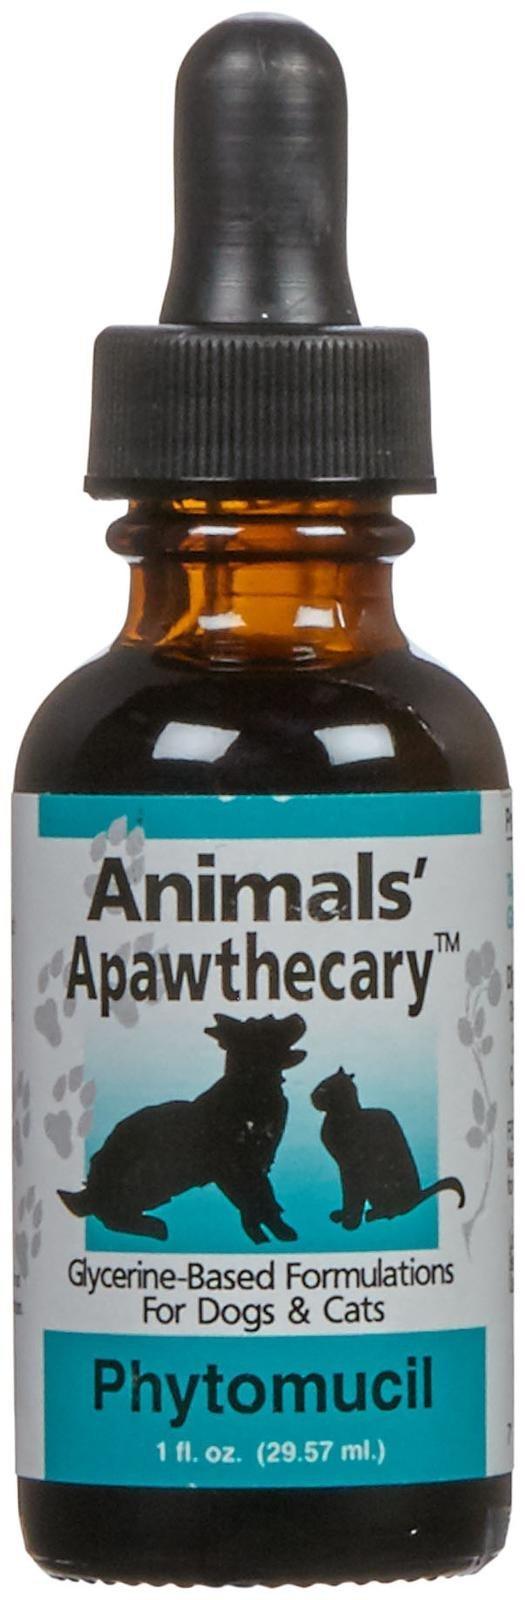 0ANIV Animals' Apawthecary Phytomucil - 1 Oz